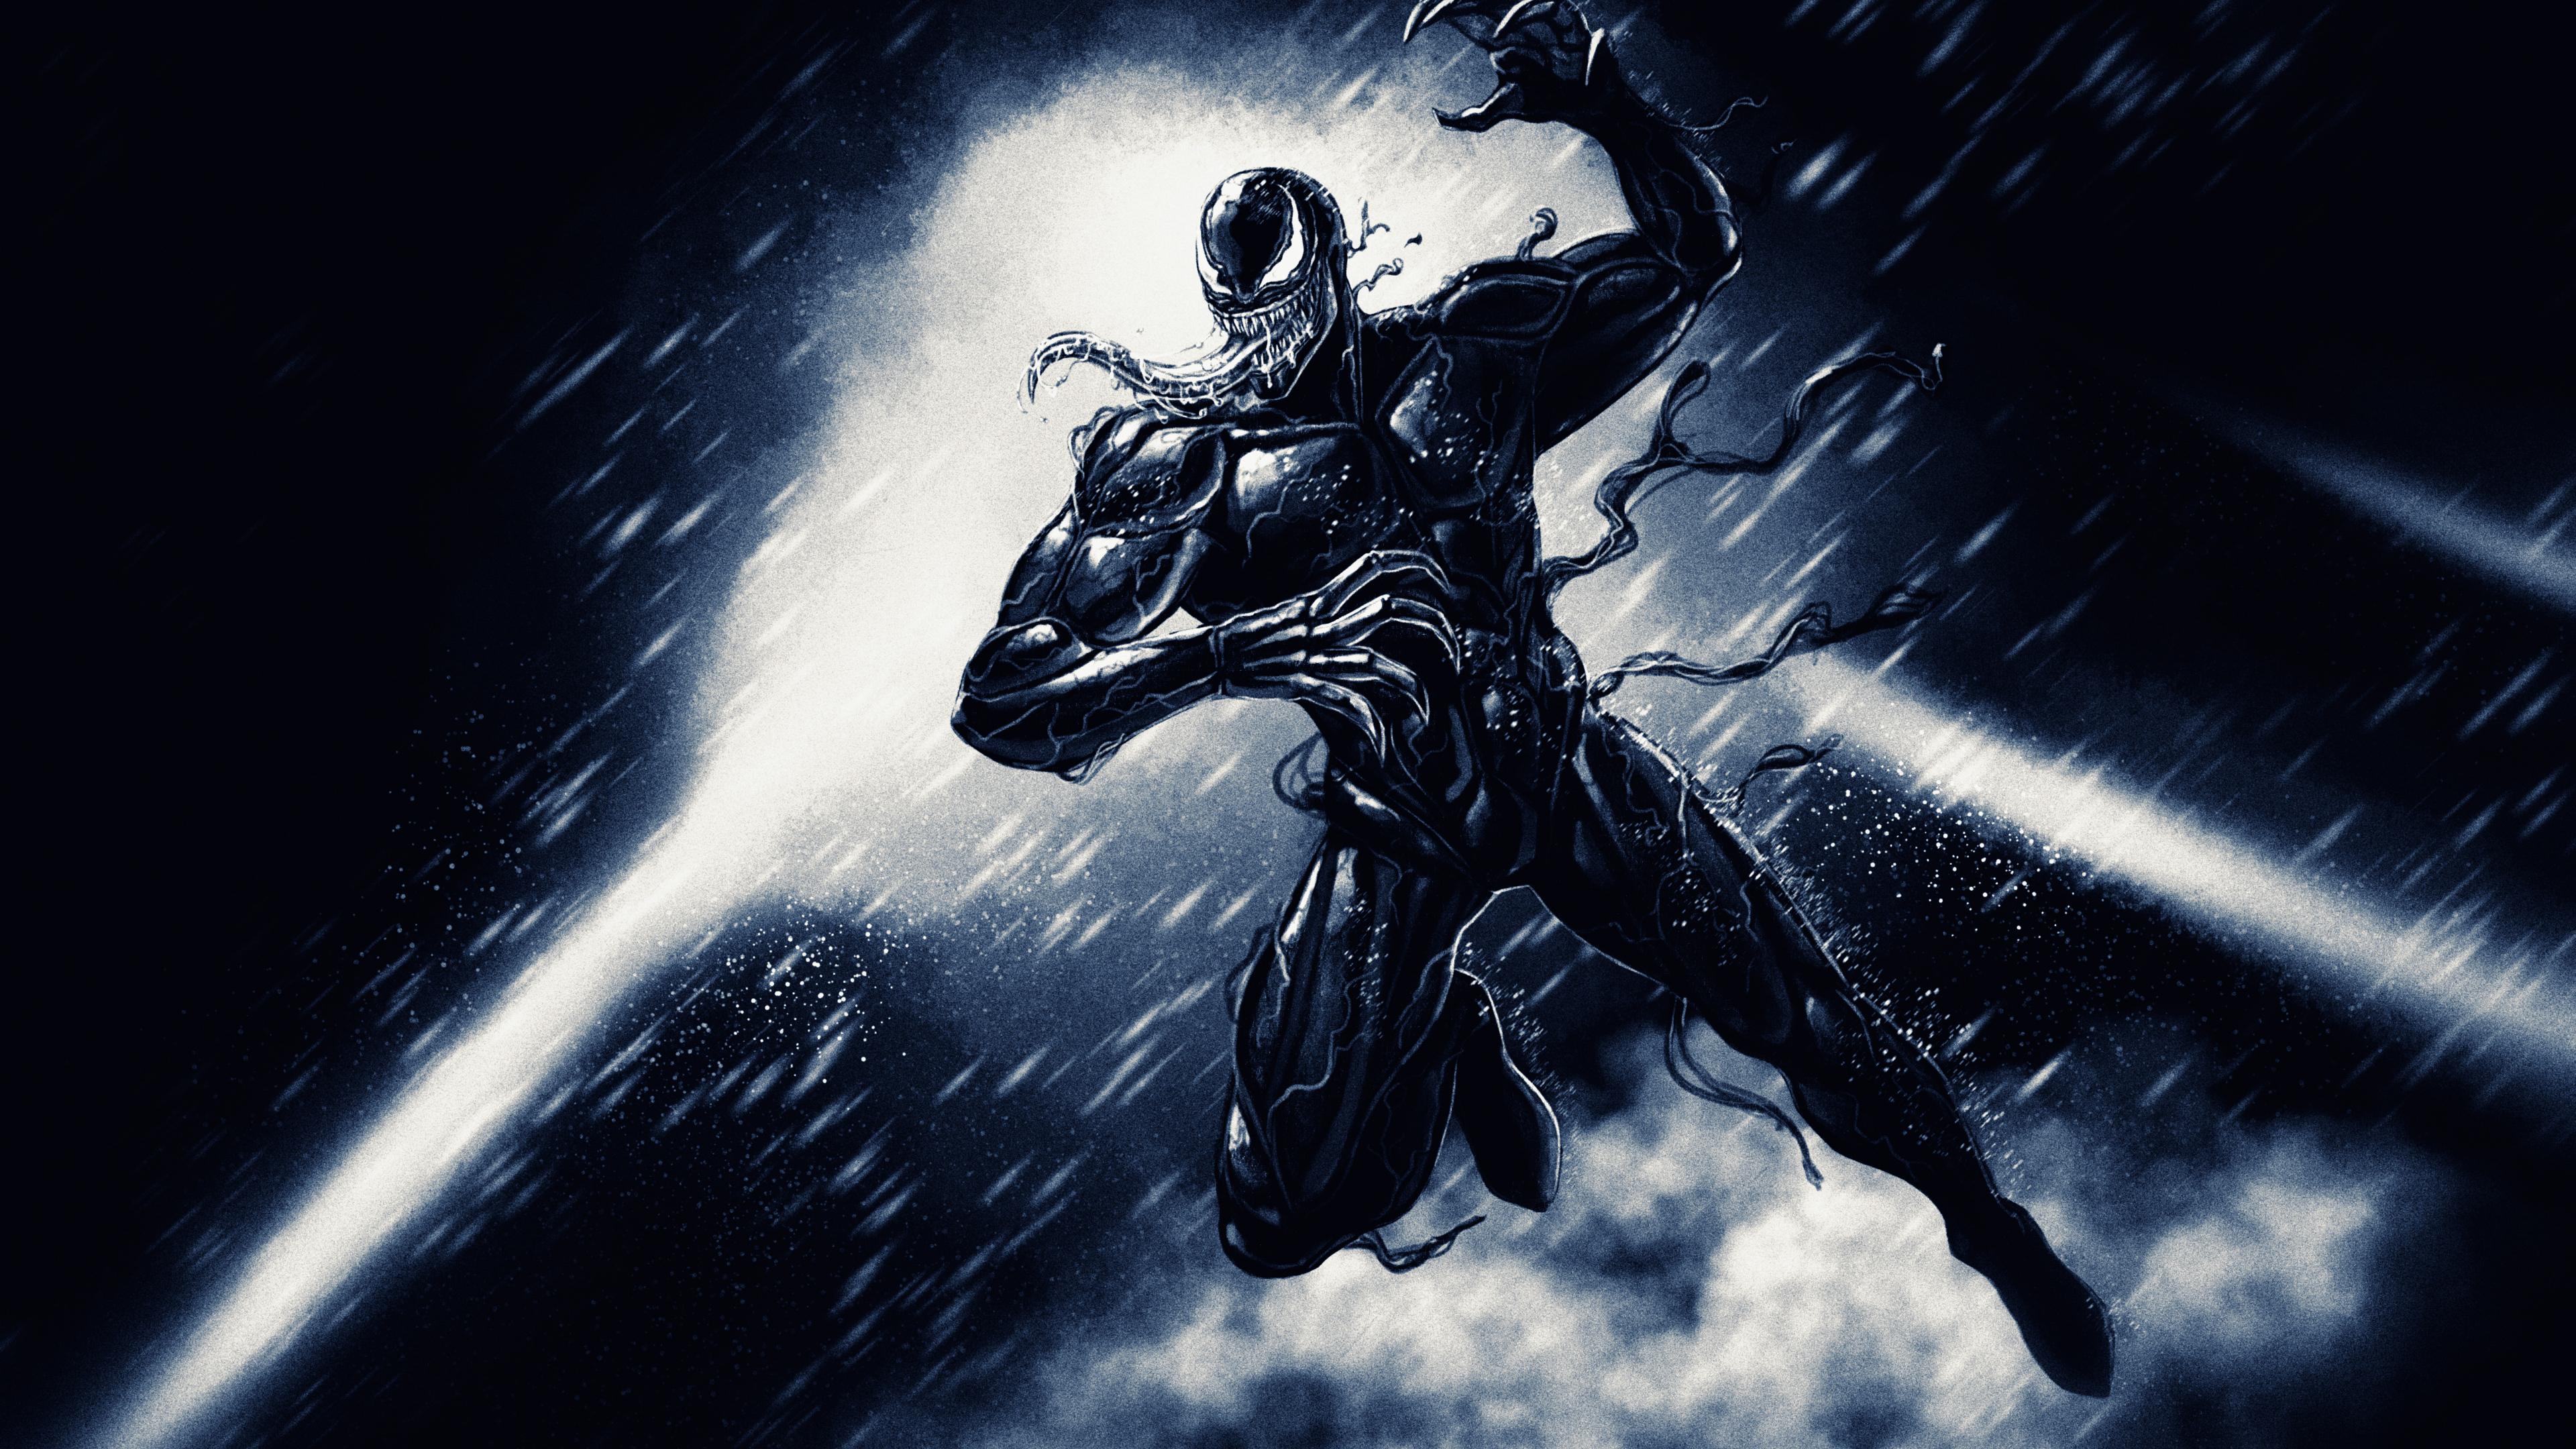 Venom 4k Artworks Venom wallpapers, supervillain ...